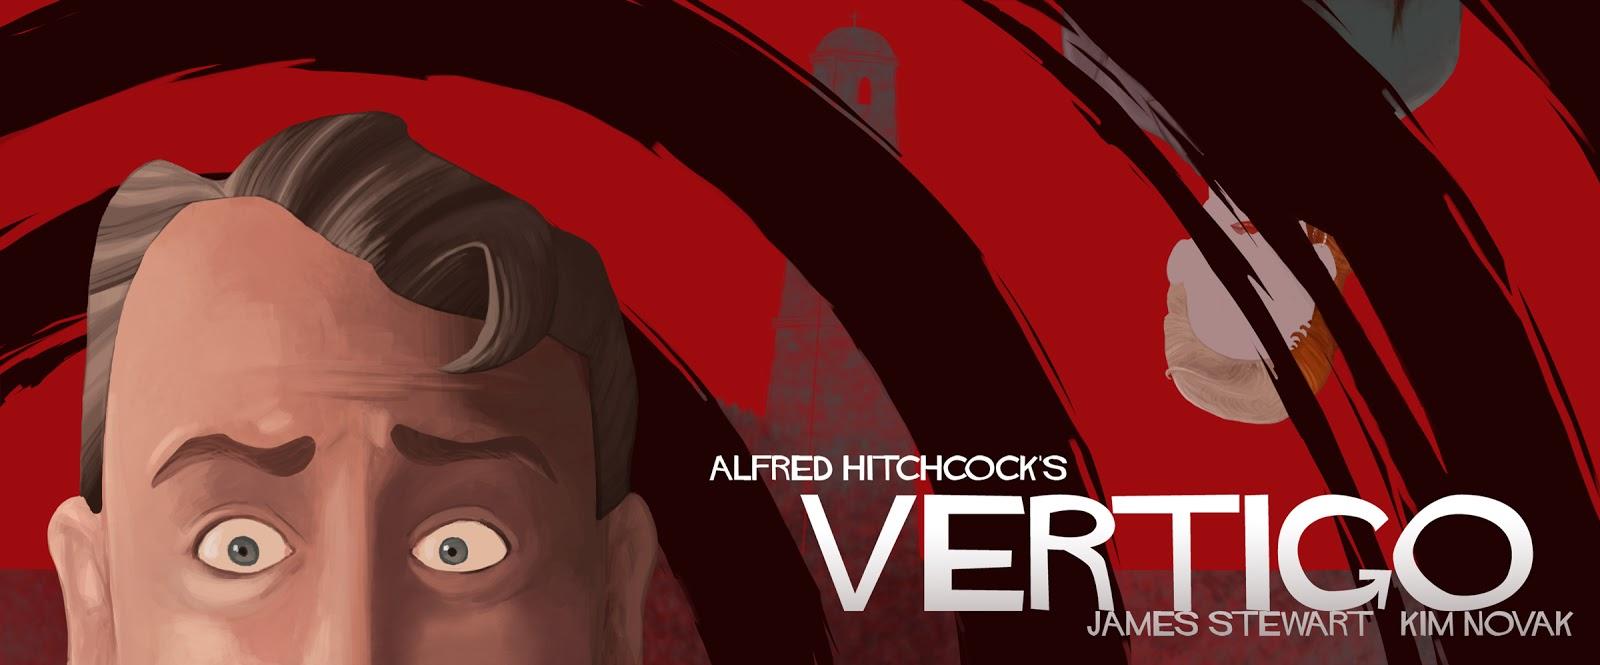 Vertigo Movie Poster - Viewing Gallery